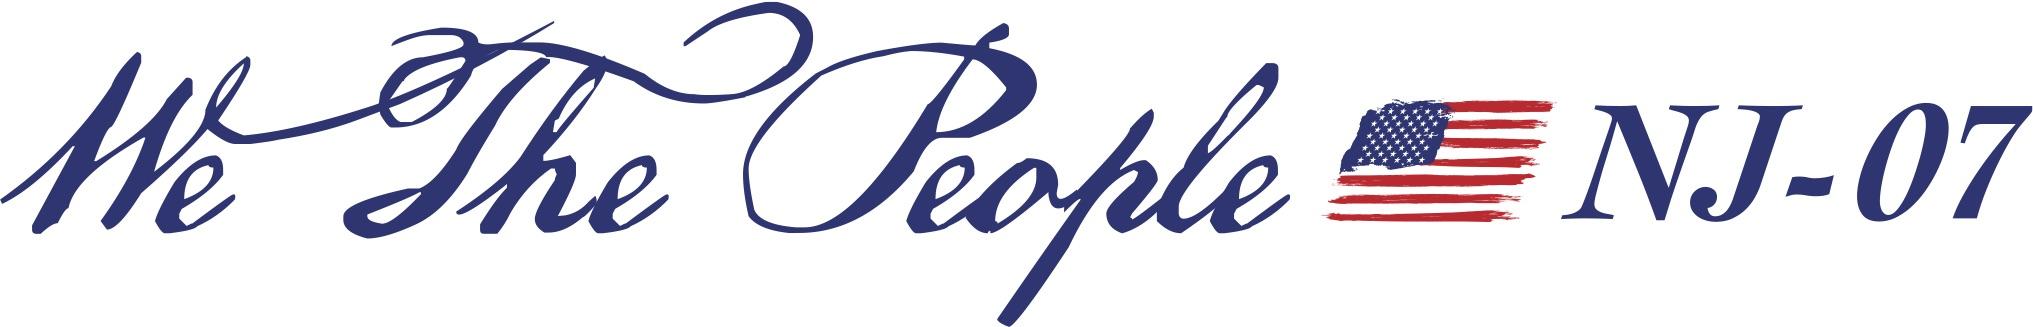 We the People NJ-07